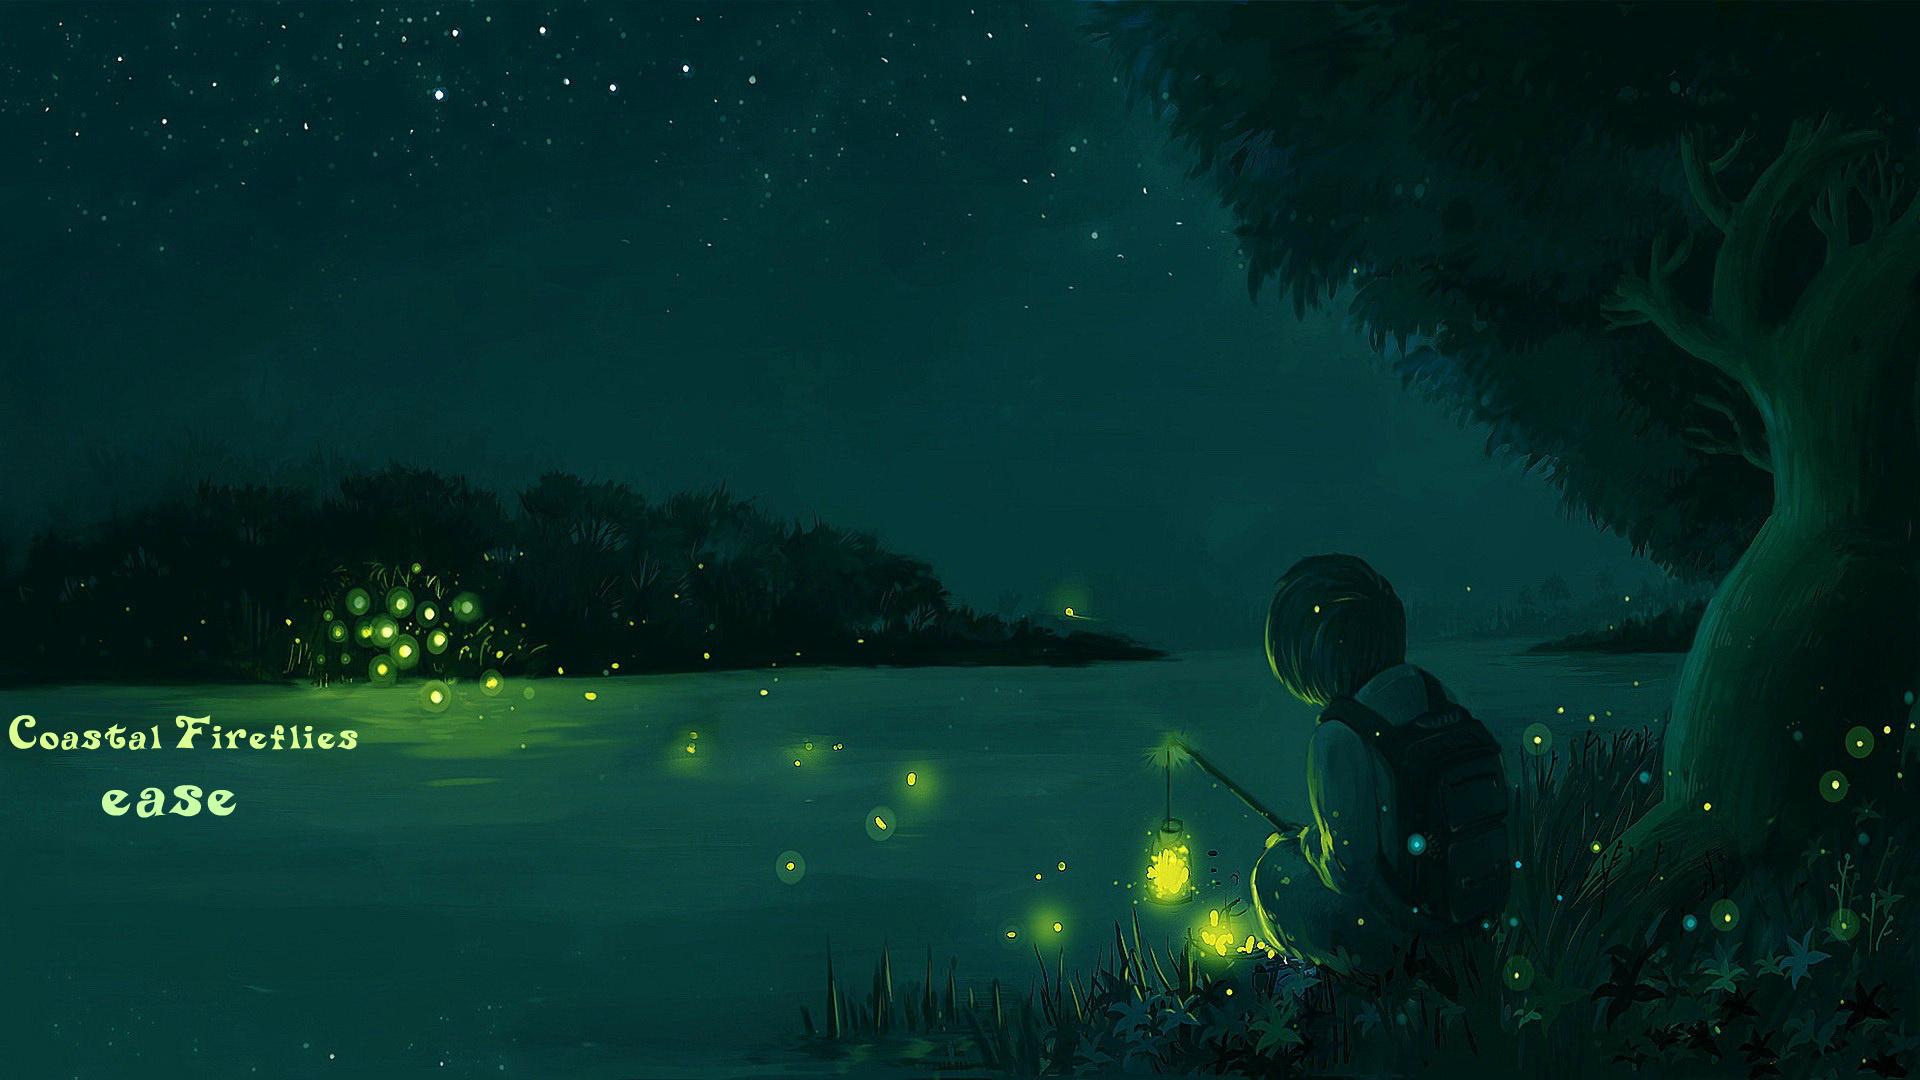 Coastal Fireflies